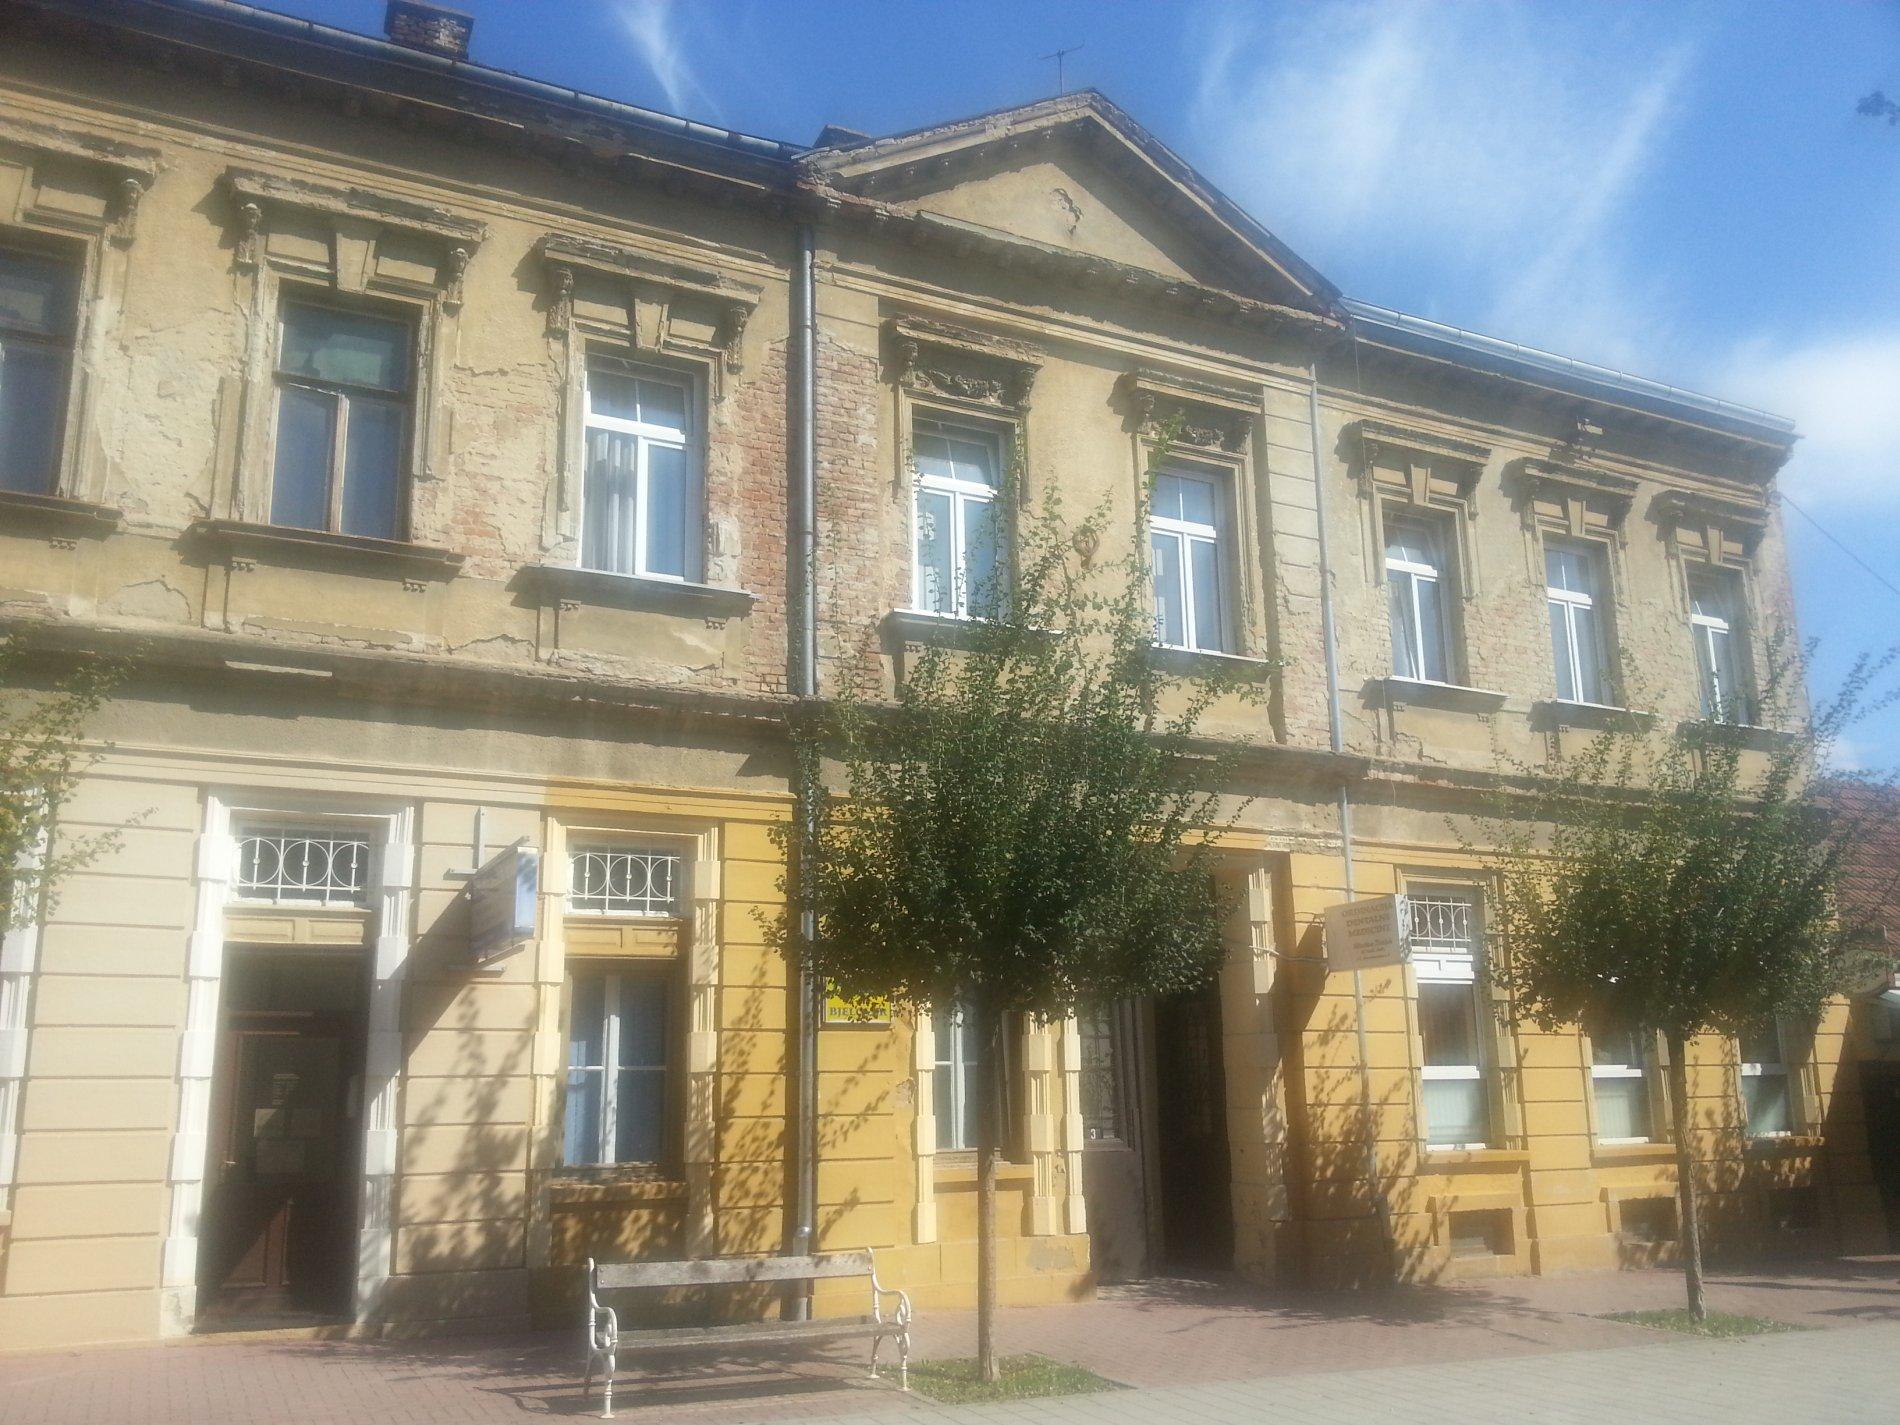 Poslovni prostori Grada Bjelovara - Ulica Josipa Juraja Strossmayera 3